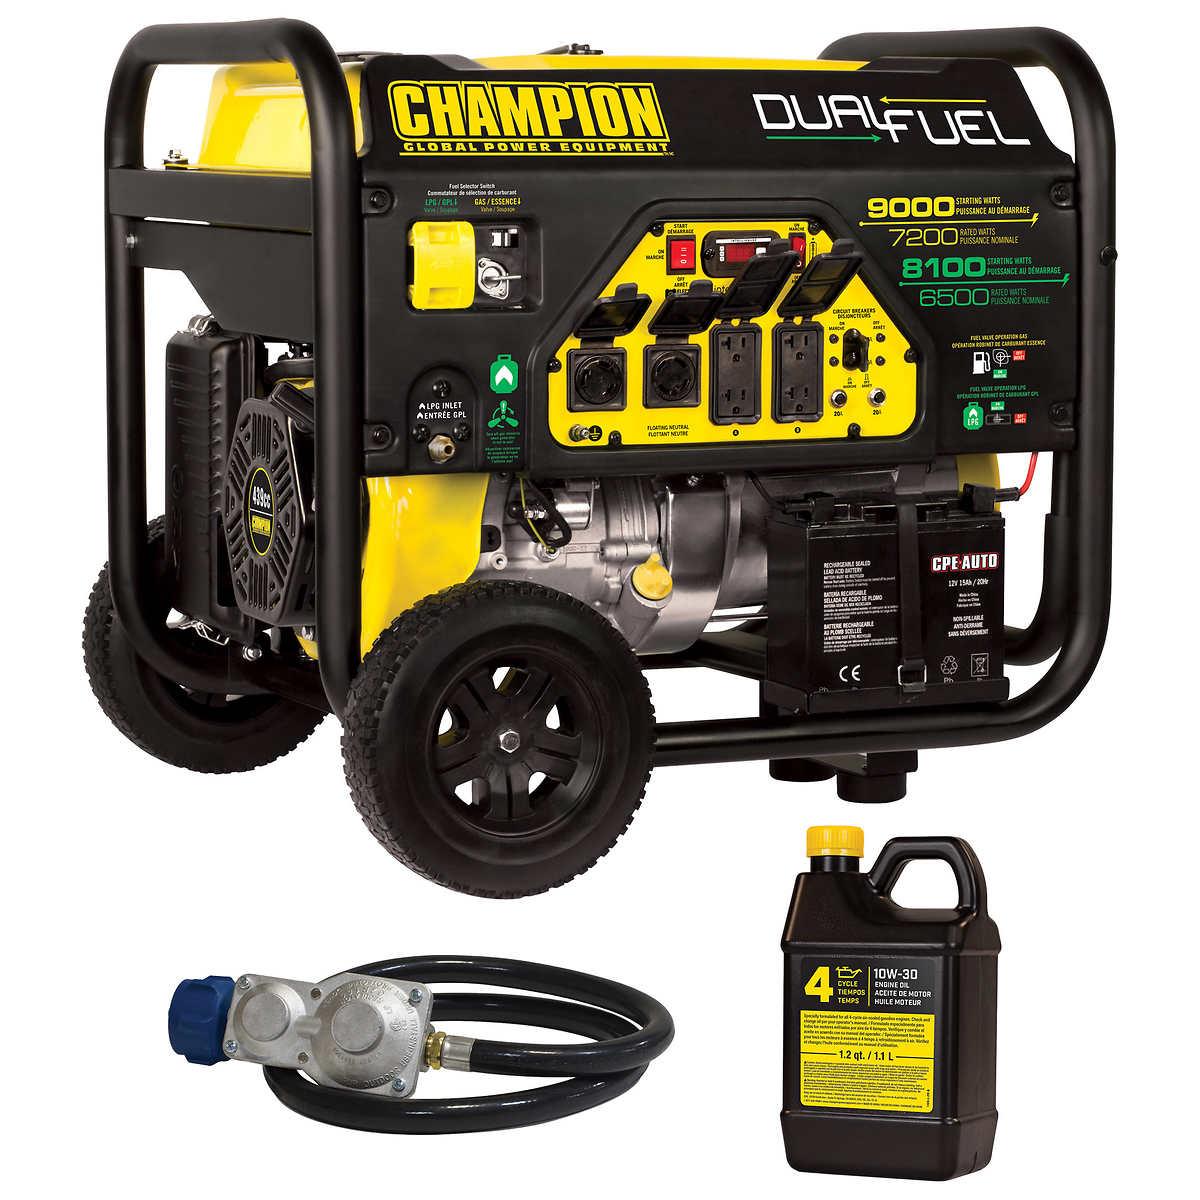 Champion 9000 W Portable Dual Fuel Generator